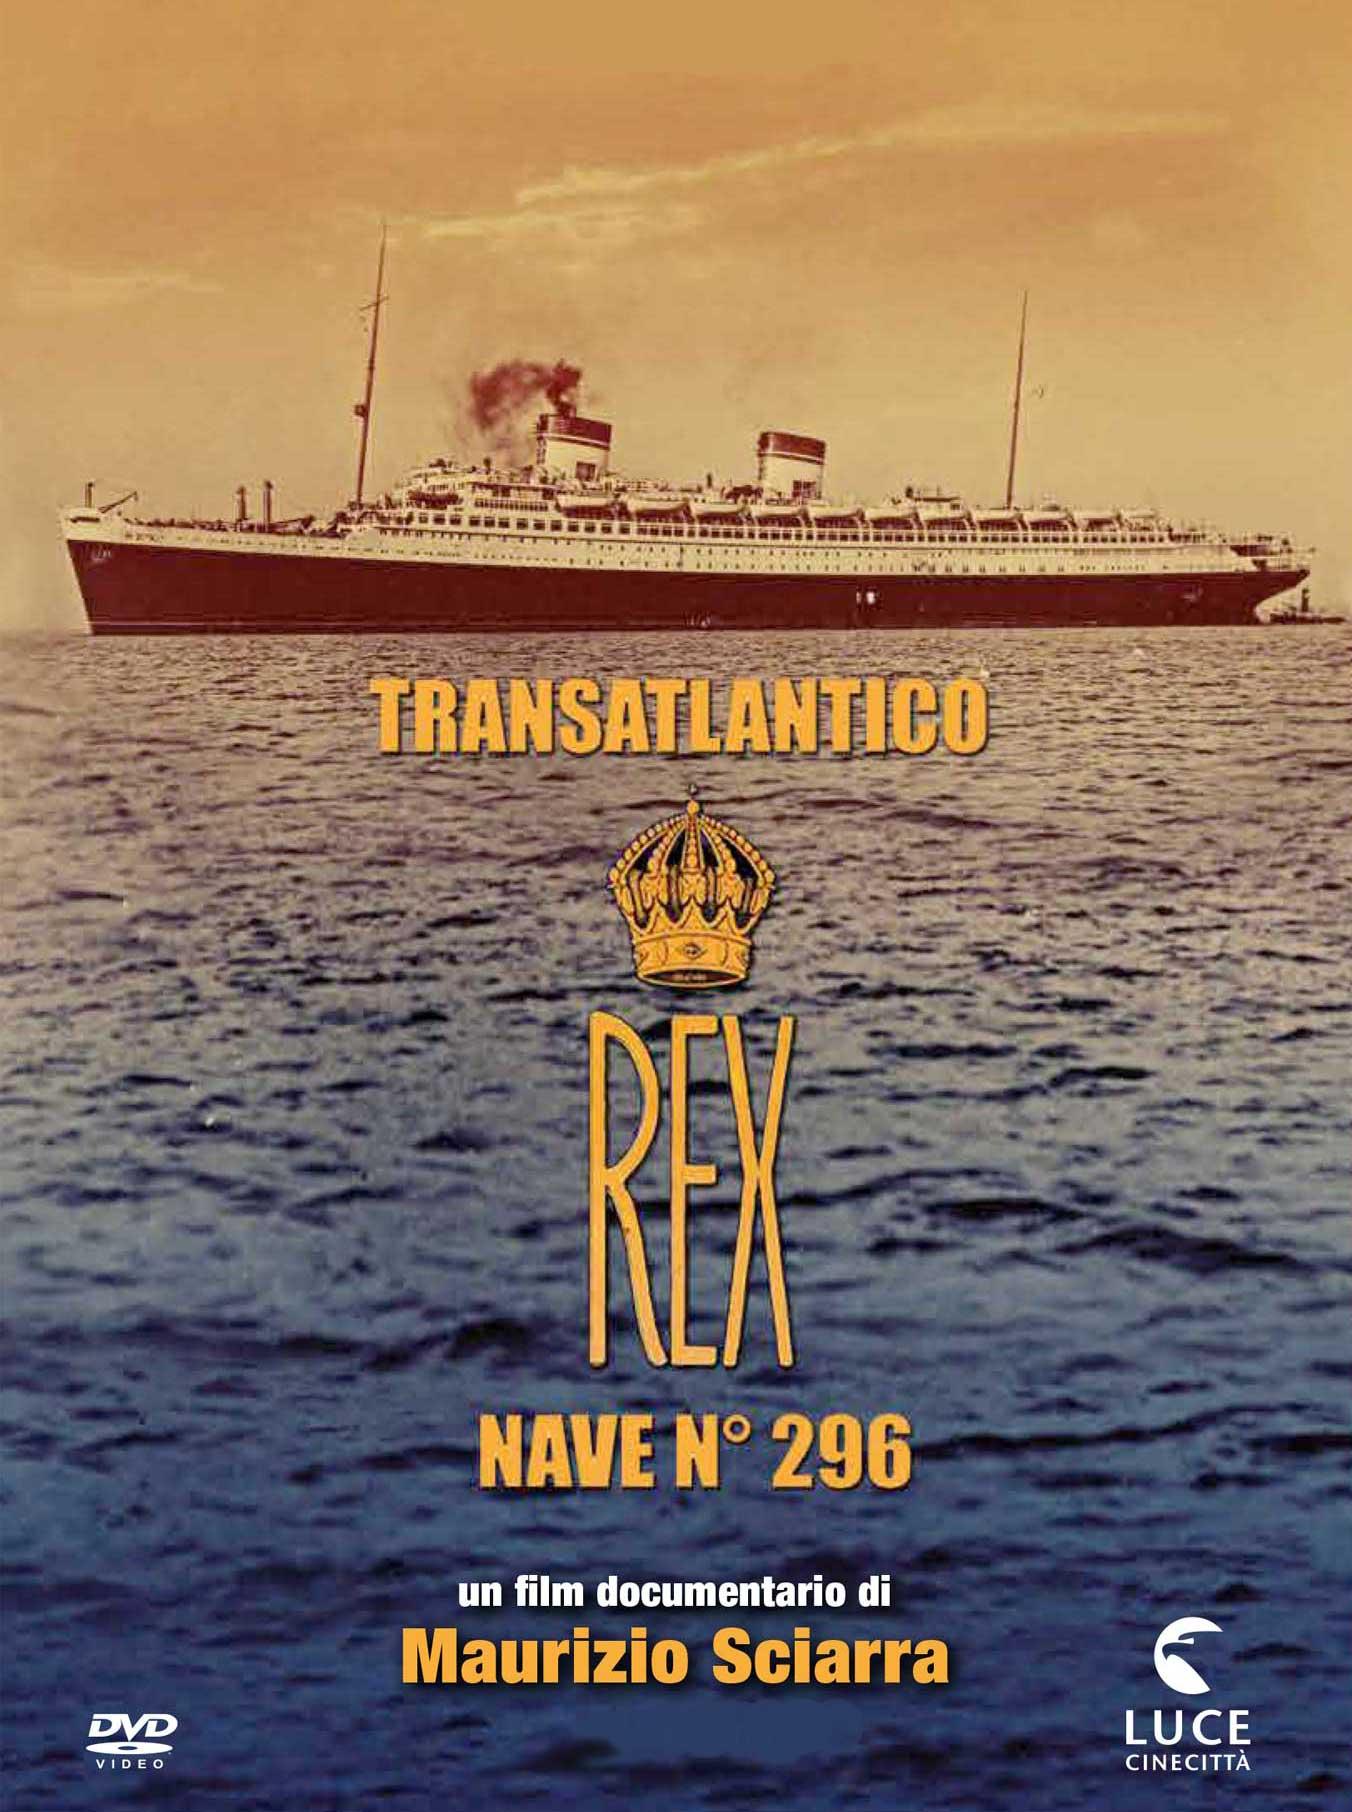 TRANSATLANTICO REX - NAVE 296 (DVD)